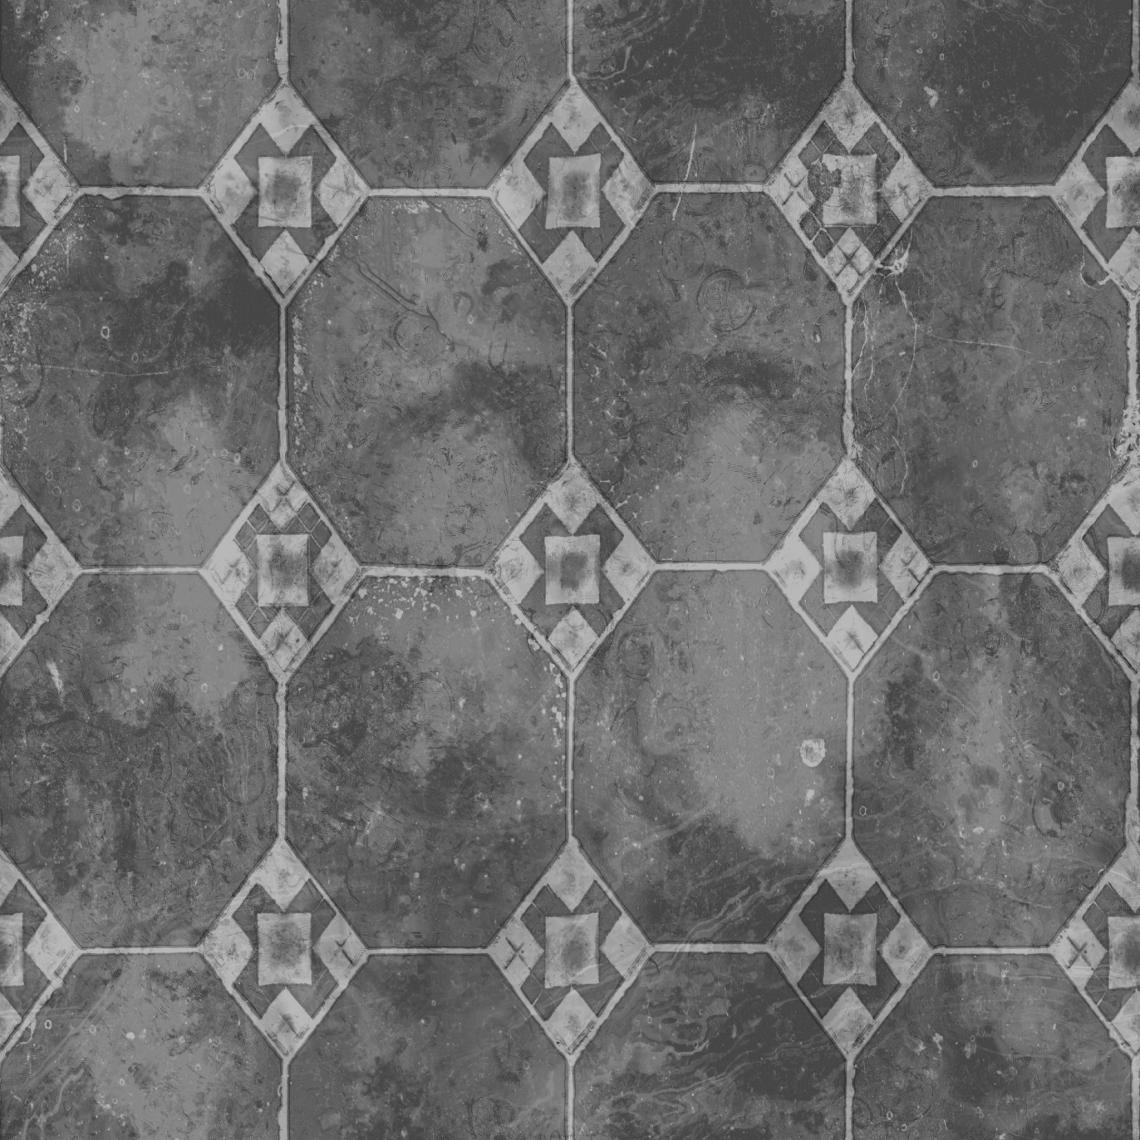 Ornate-Tiles-02-Roughness - Seamless